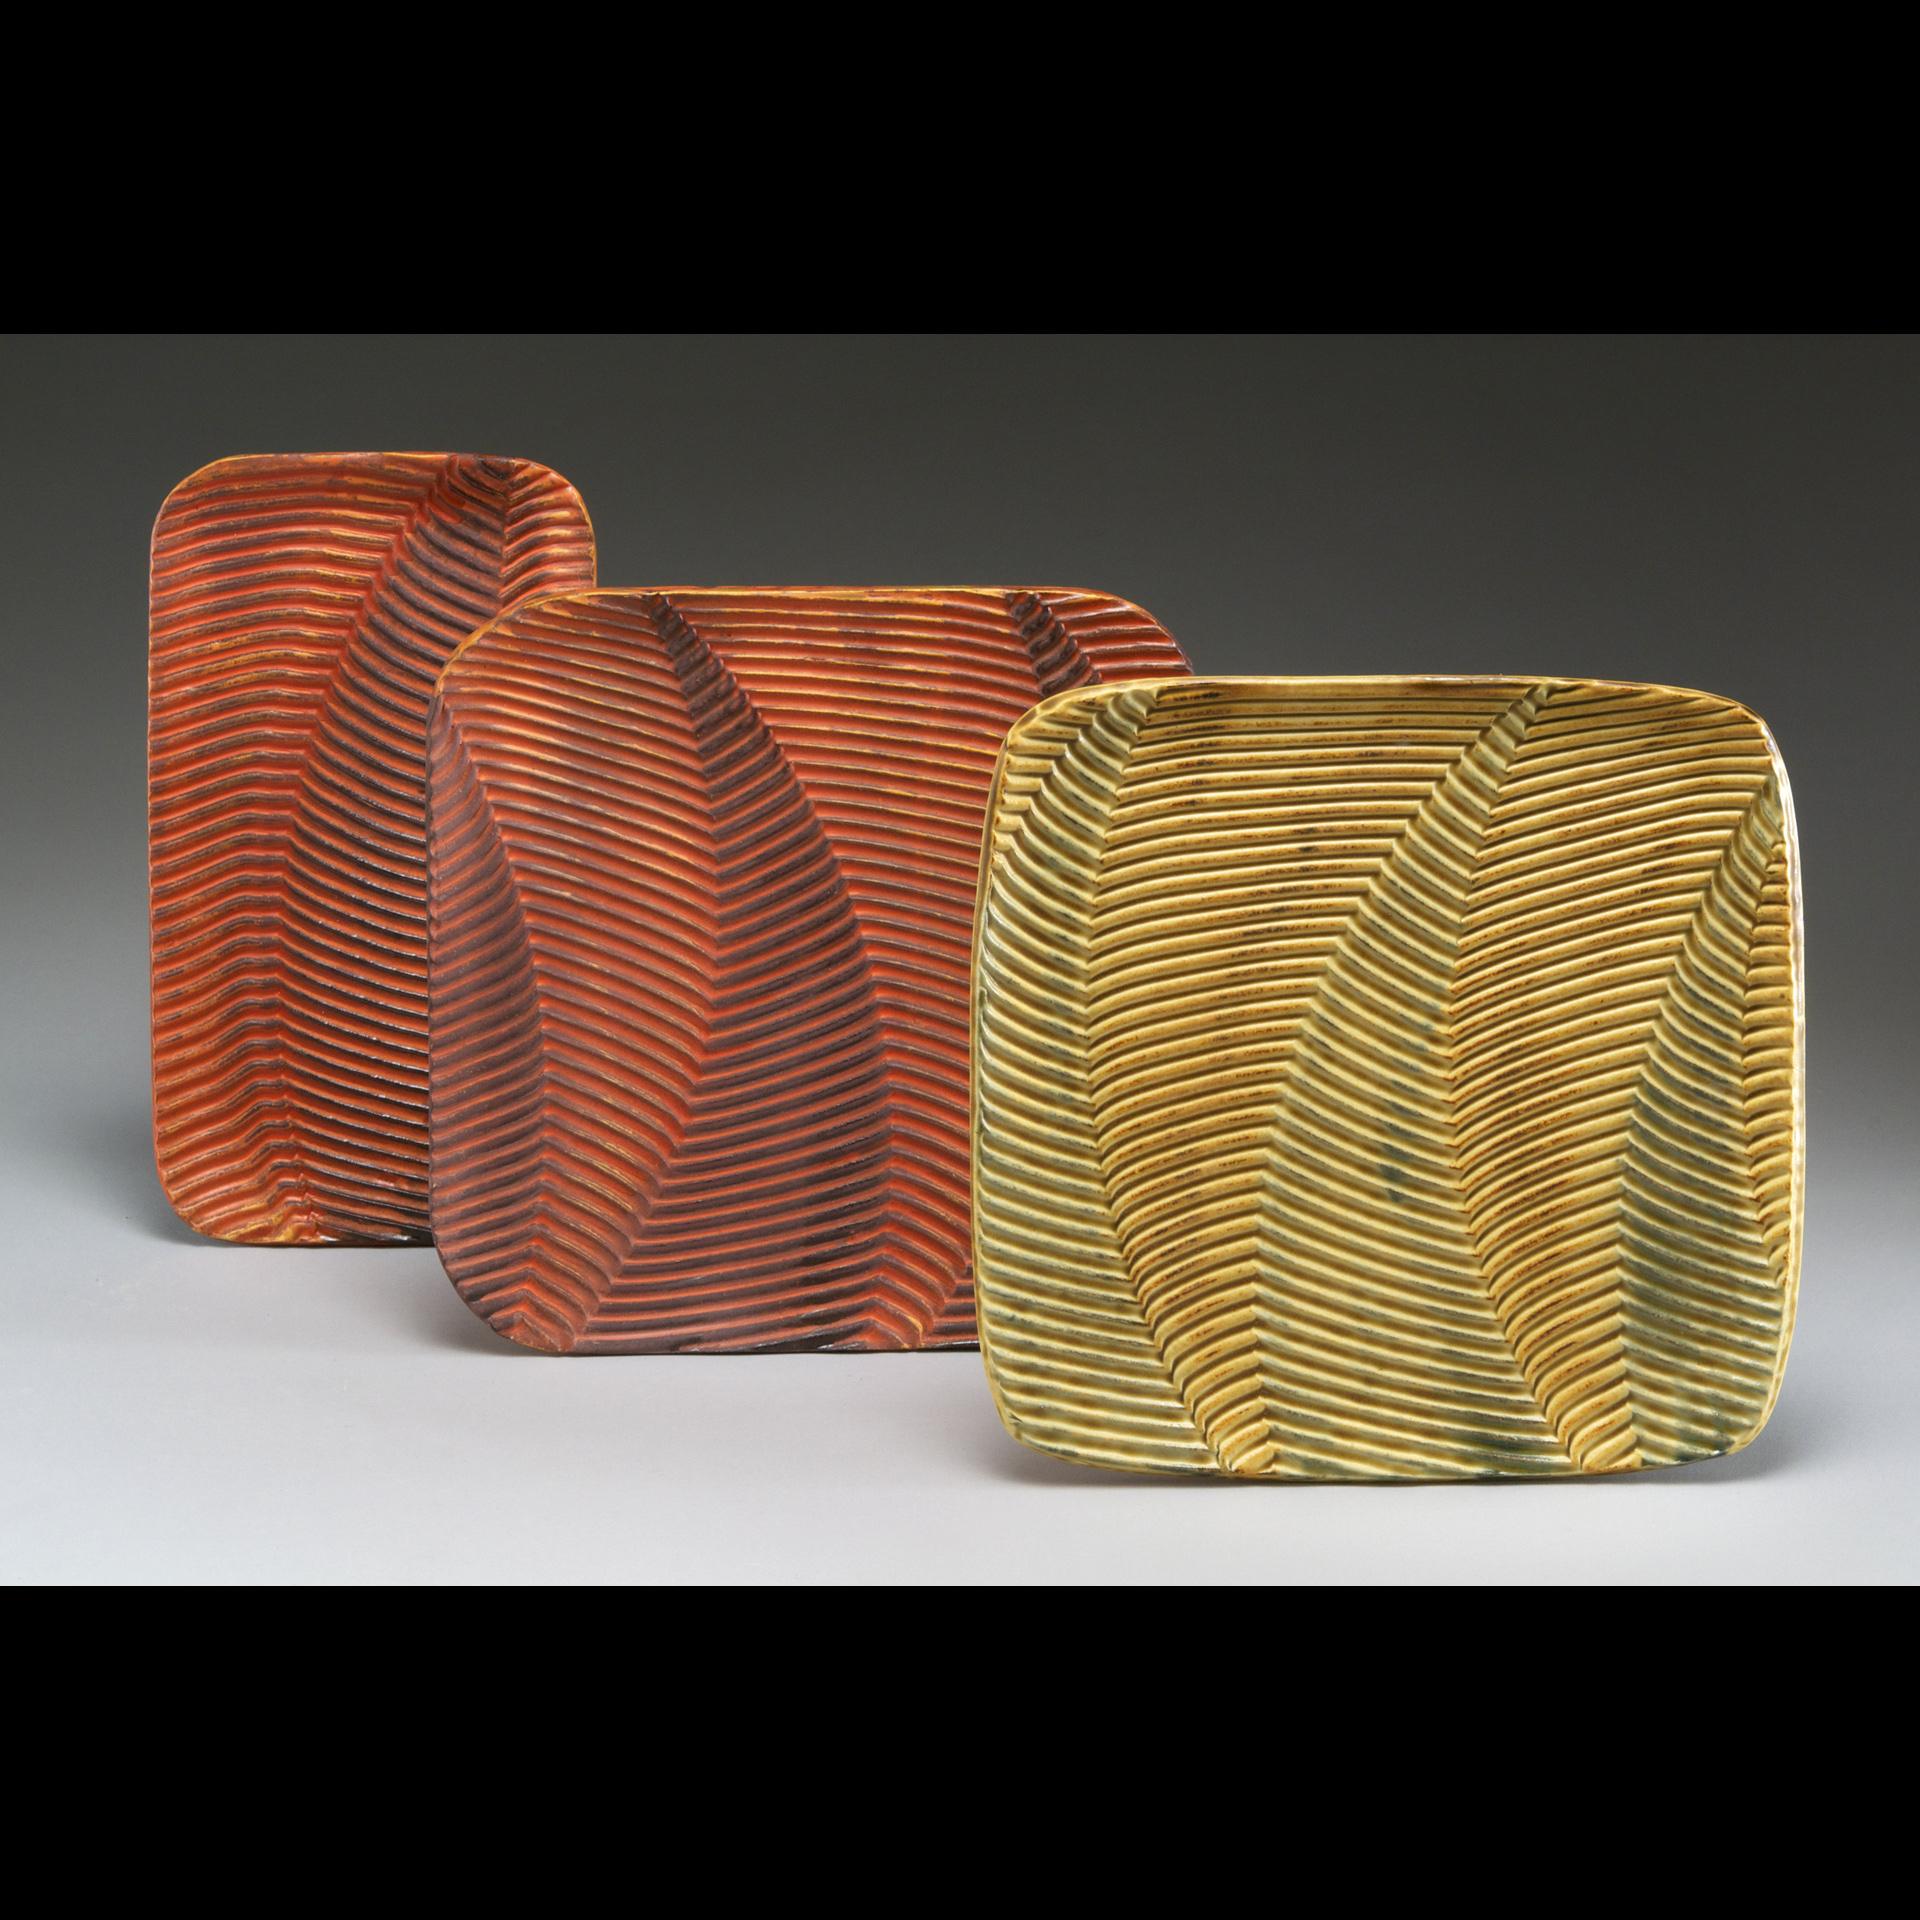 Textured Plates